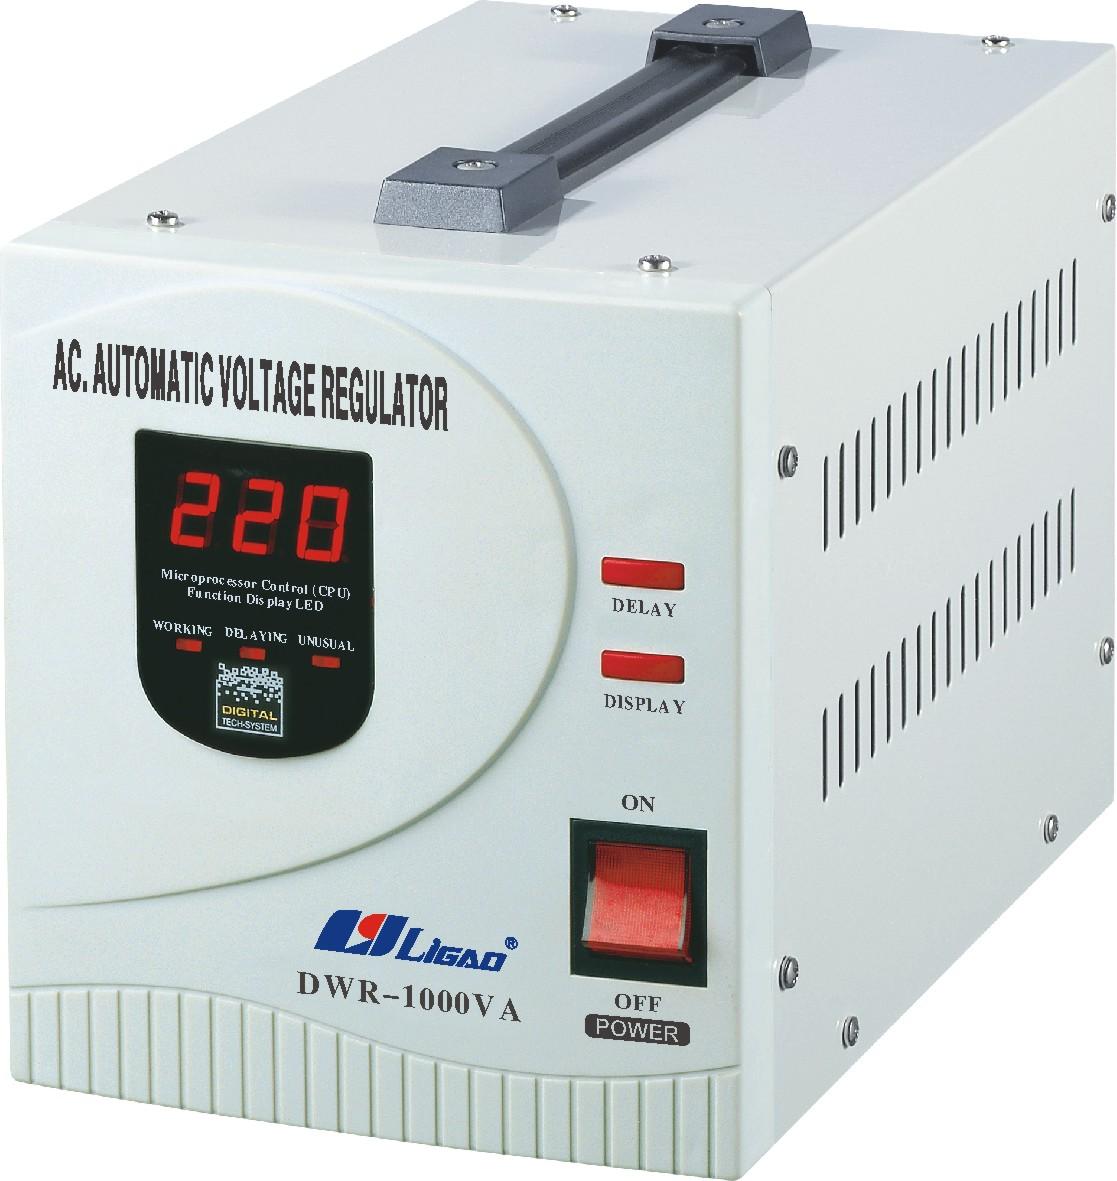 High Voltage Regulator : Automatic voltage regulator dwr va